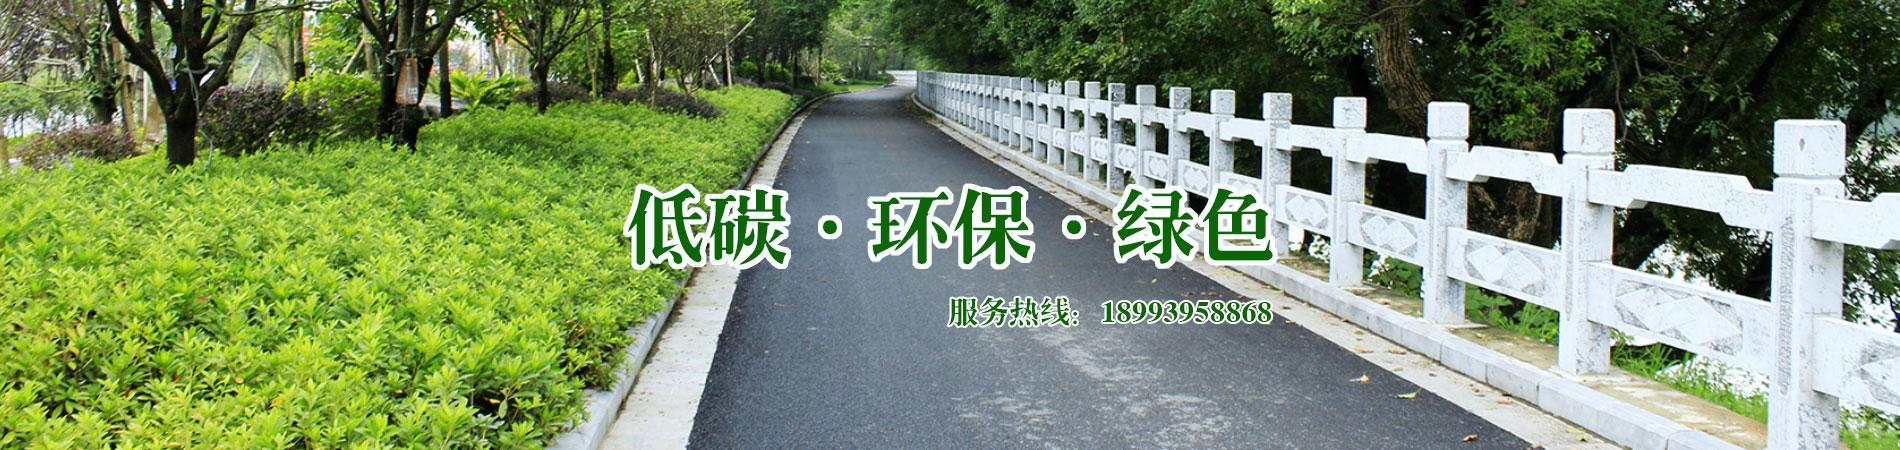 �m州水◆泥���谧o��S家